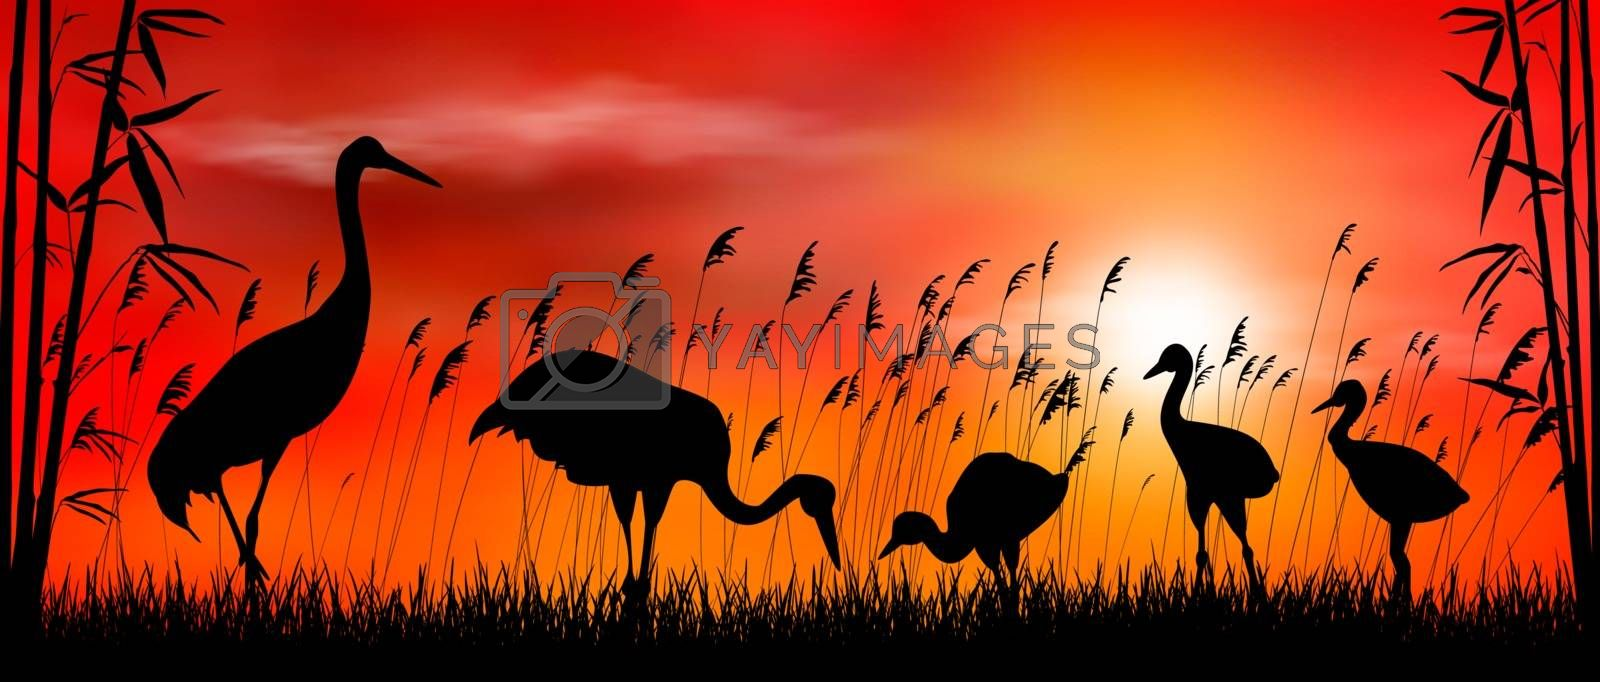 Birds cranes on sunset background. Evening, sky, sun. Birds on a background of grass, bamboo and reeds. Evening landscape. Wildlife scene.